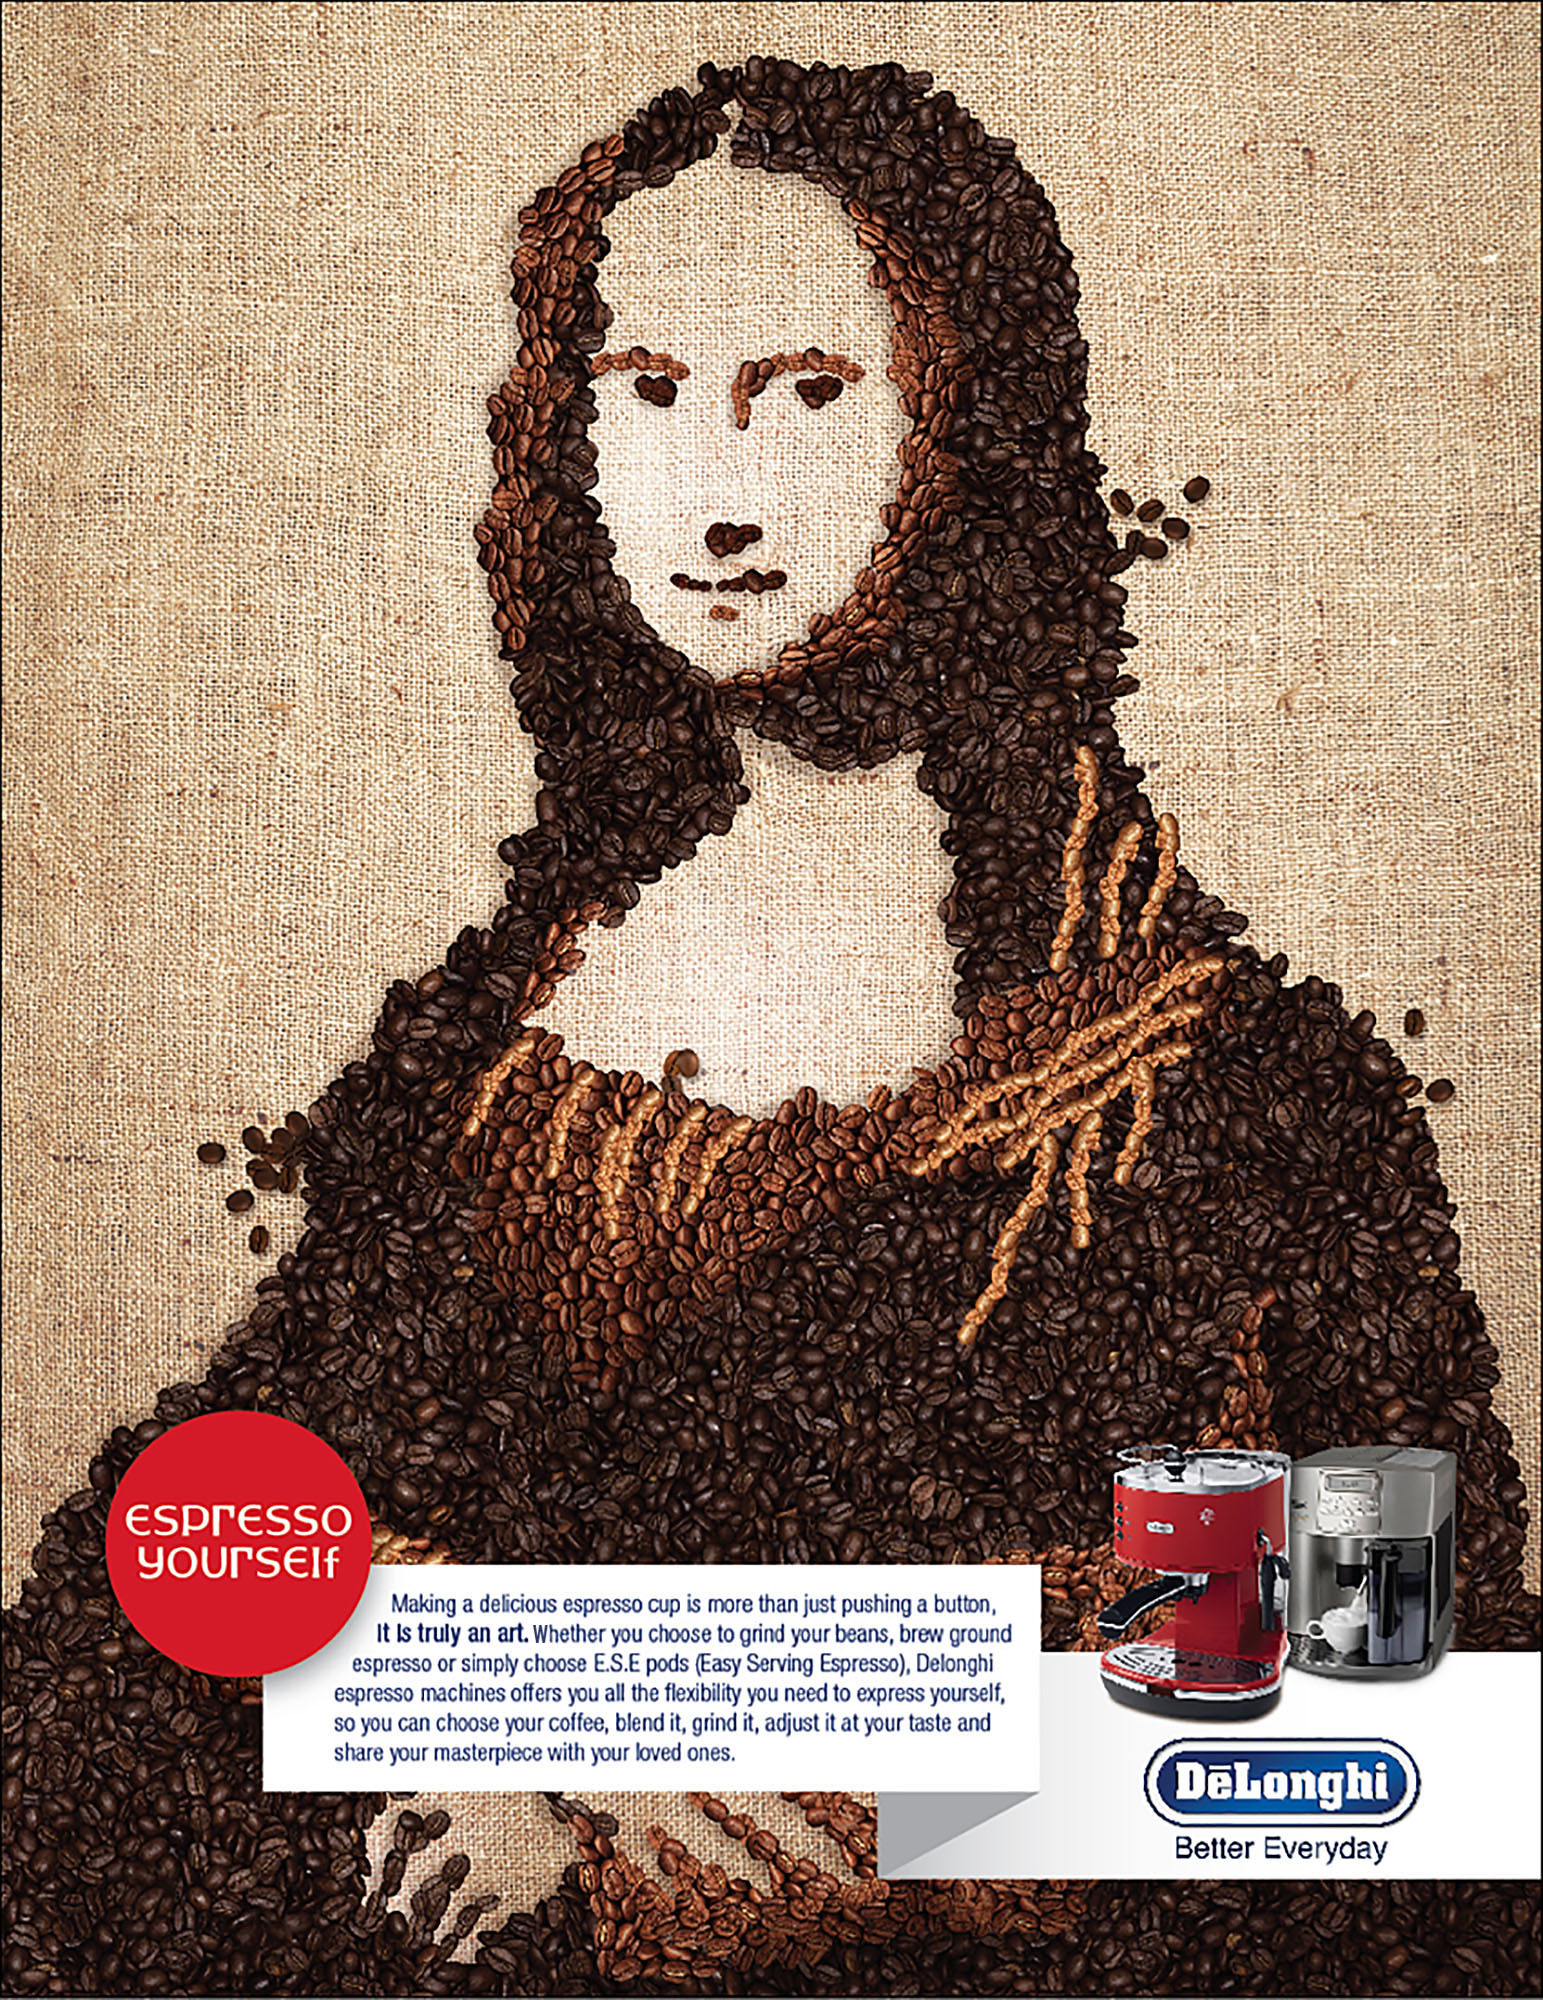 Delonghi 'Mona Lisa' Press Ad